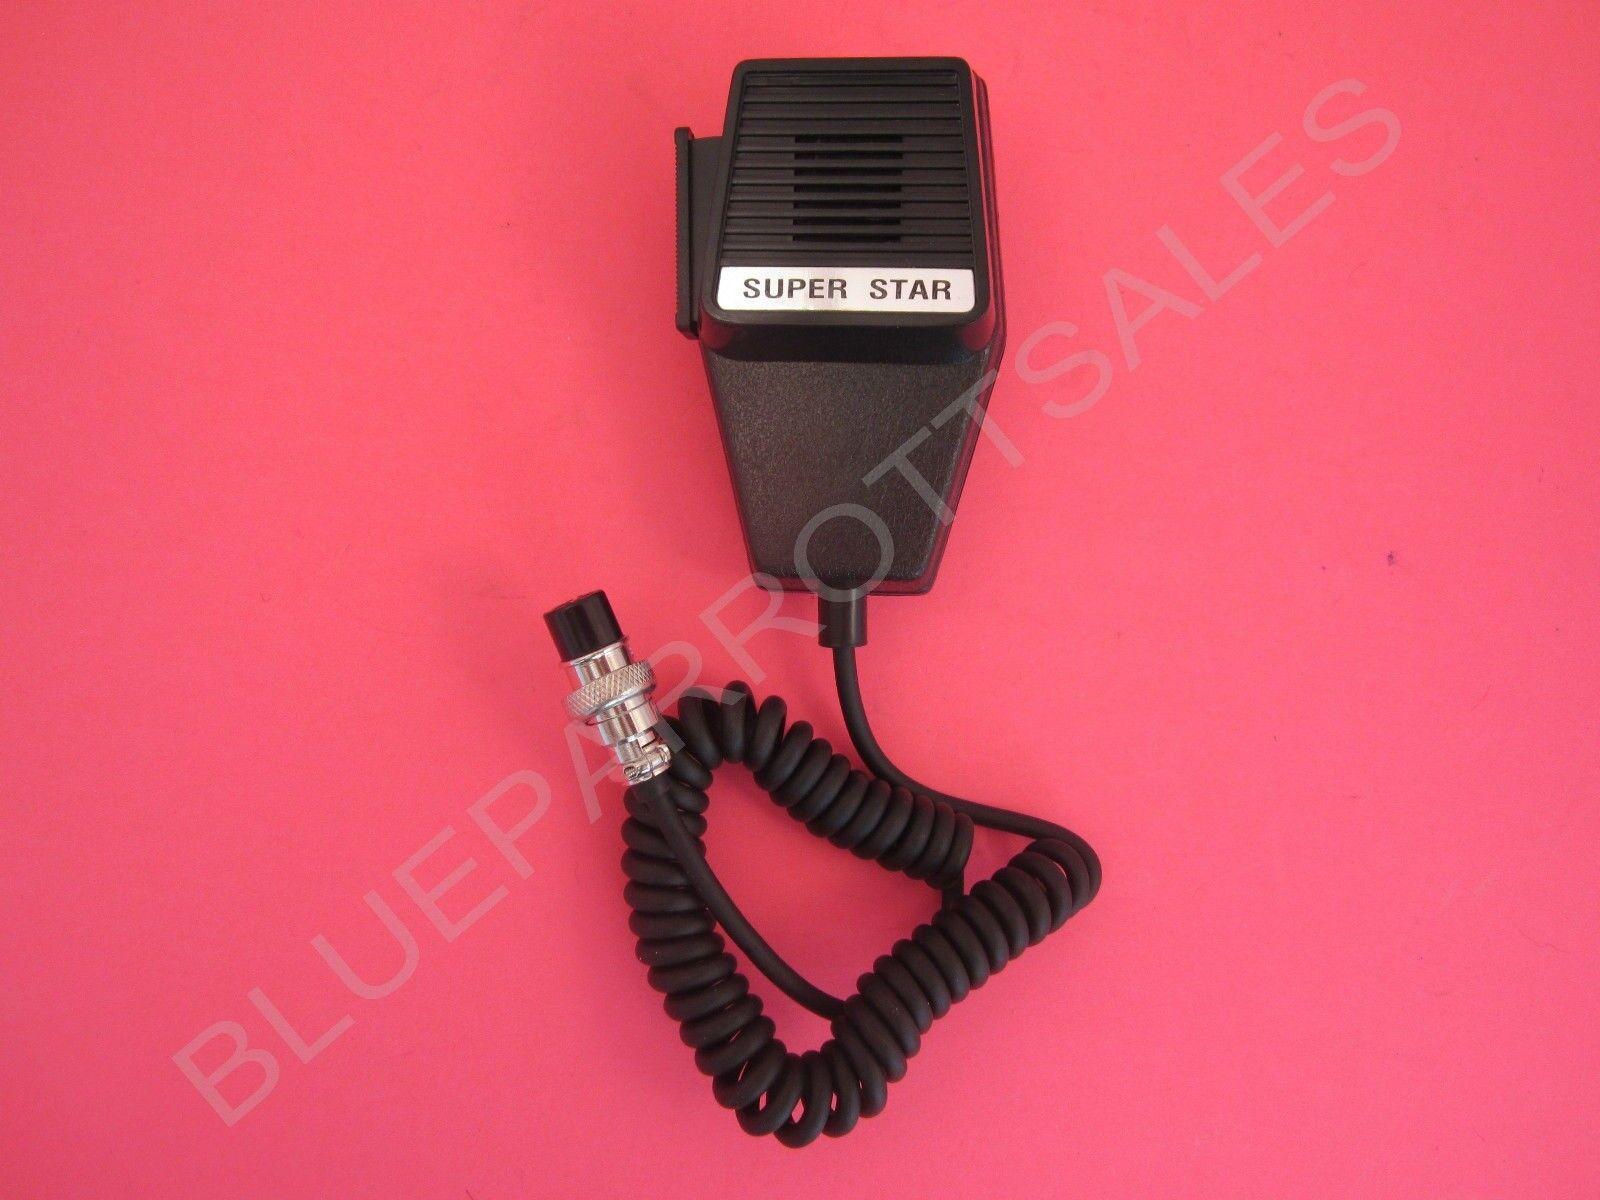 Workman Cm4 Superstar Cb Radio Microphone Ebay Shack Mic Wiring Norton Secured Powered By Verisign